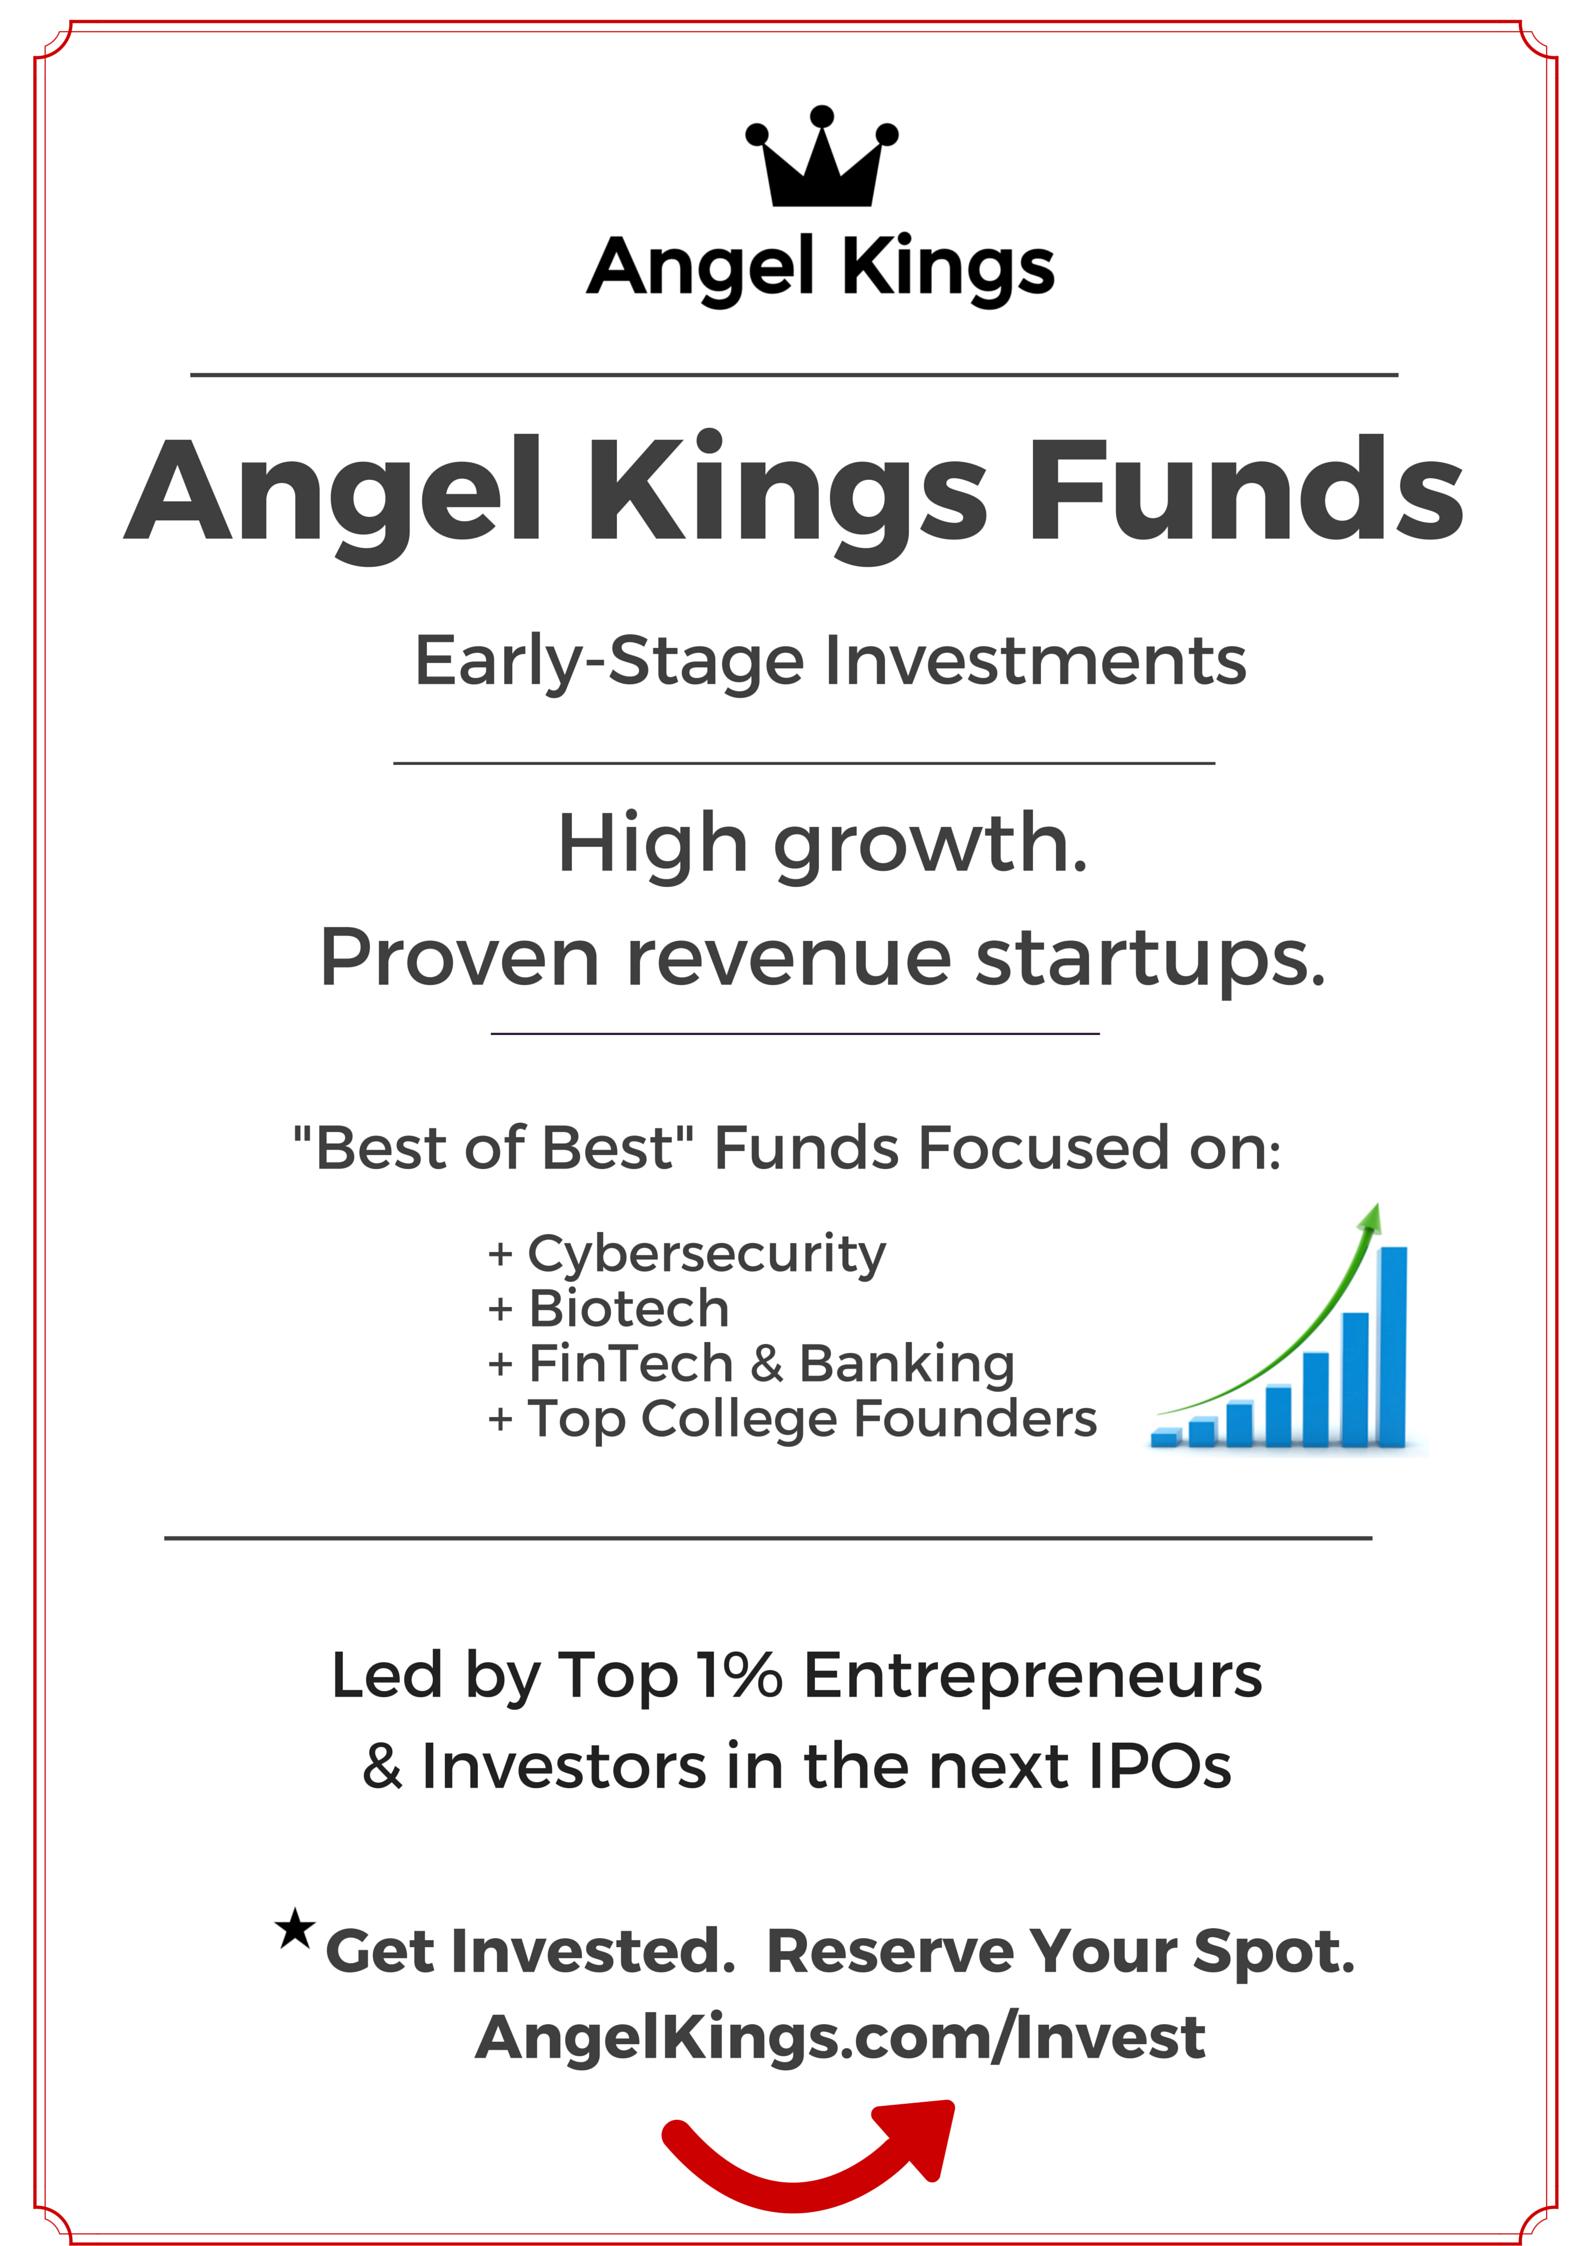 dorm-room-fund-startups